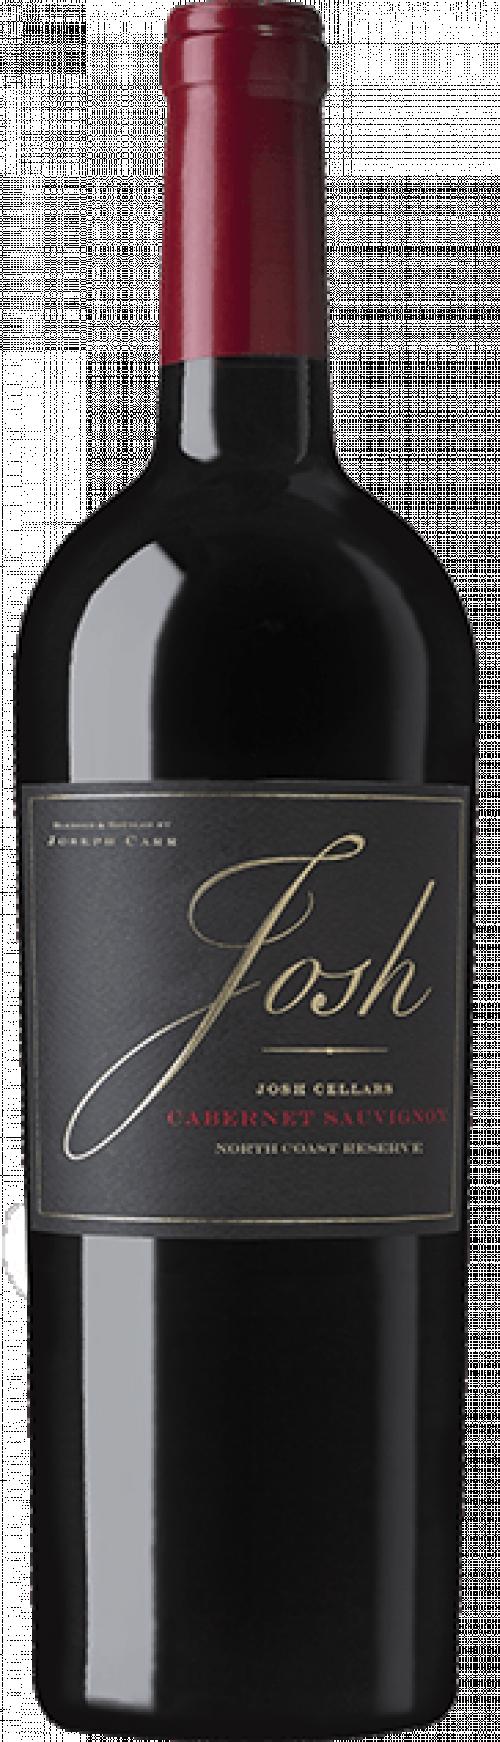 2018 Josh Cellars North Coast Cabernet Sauvignon 750ml